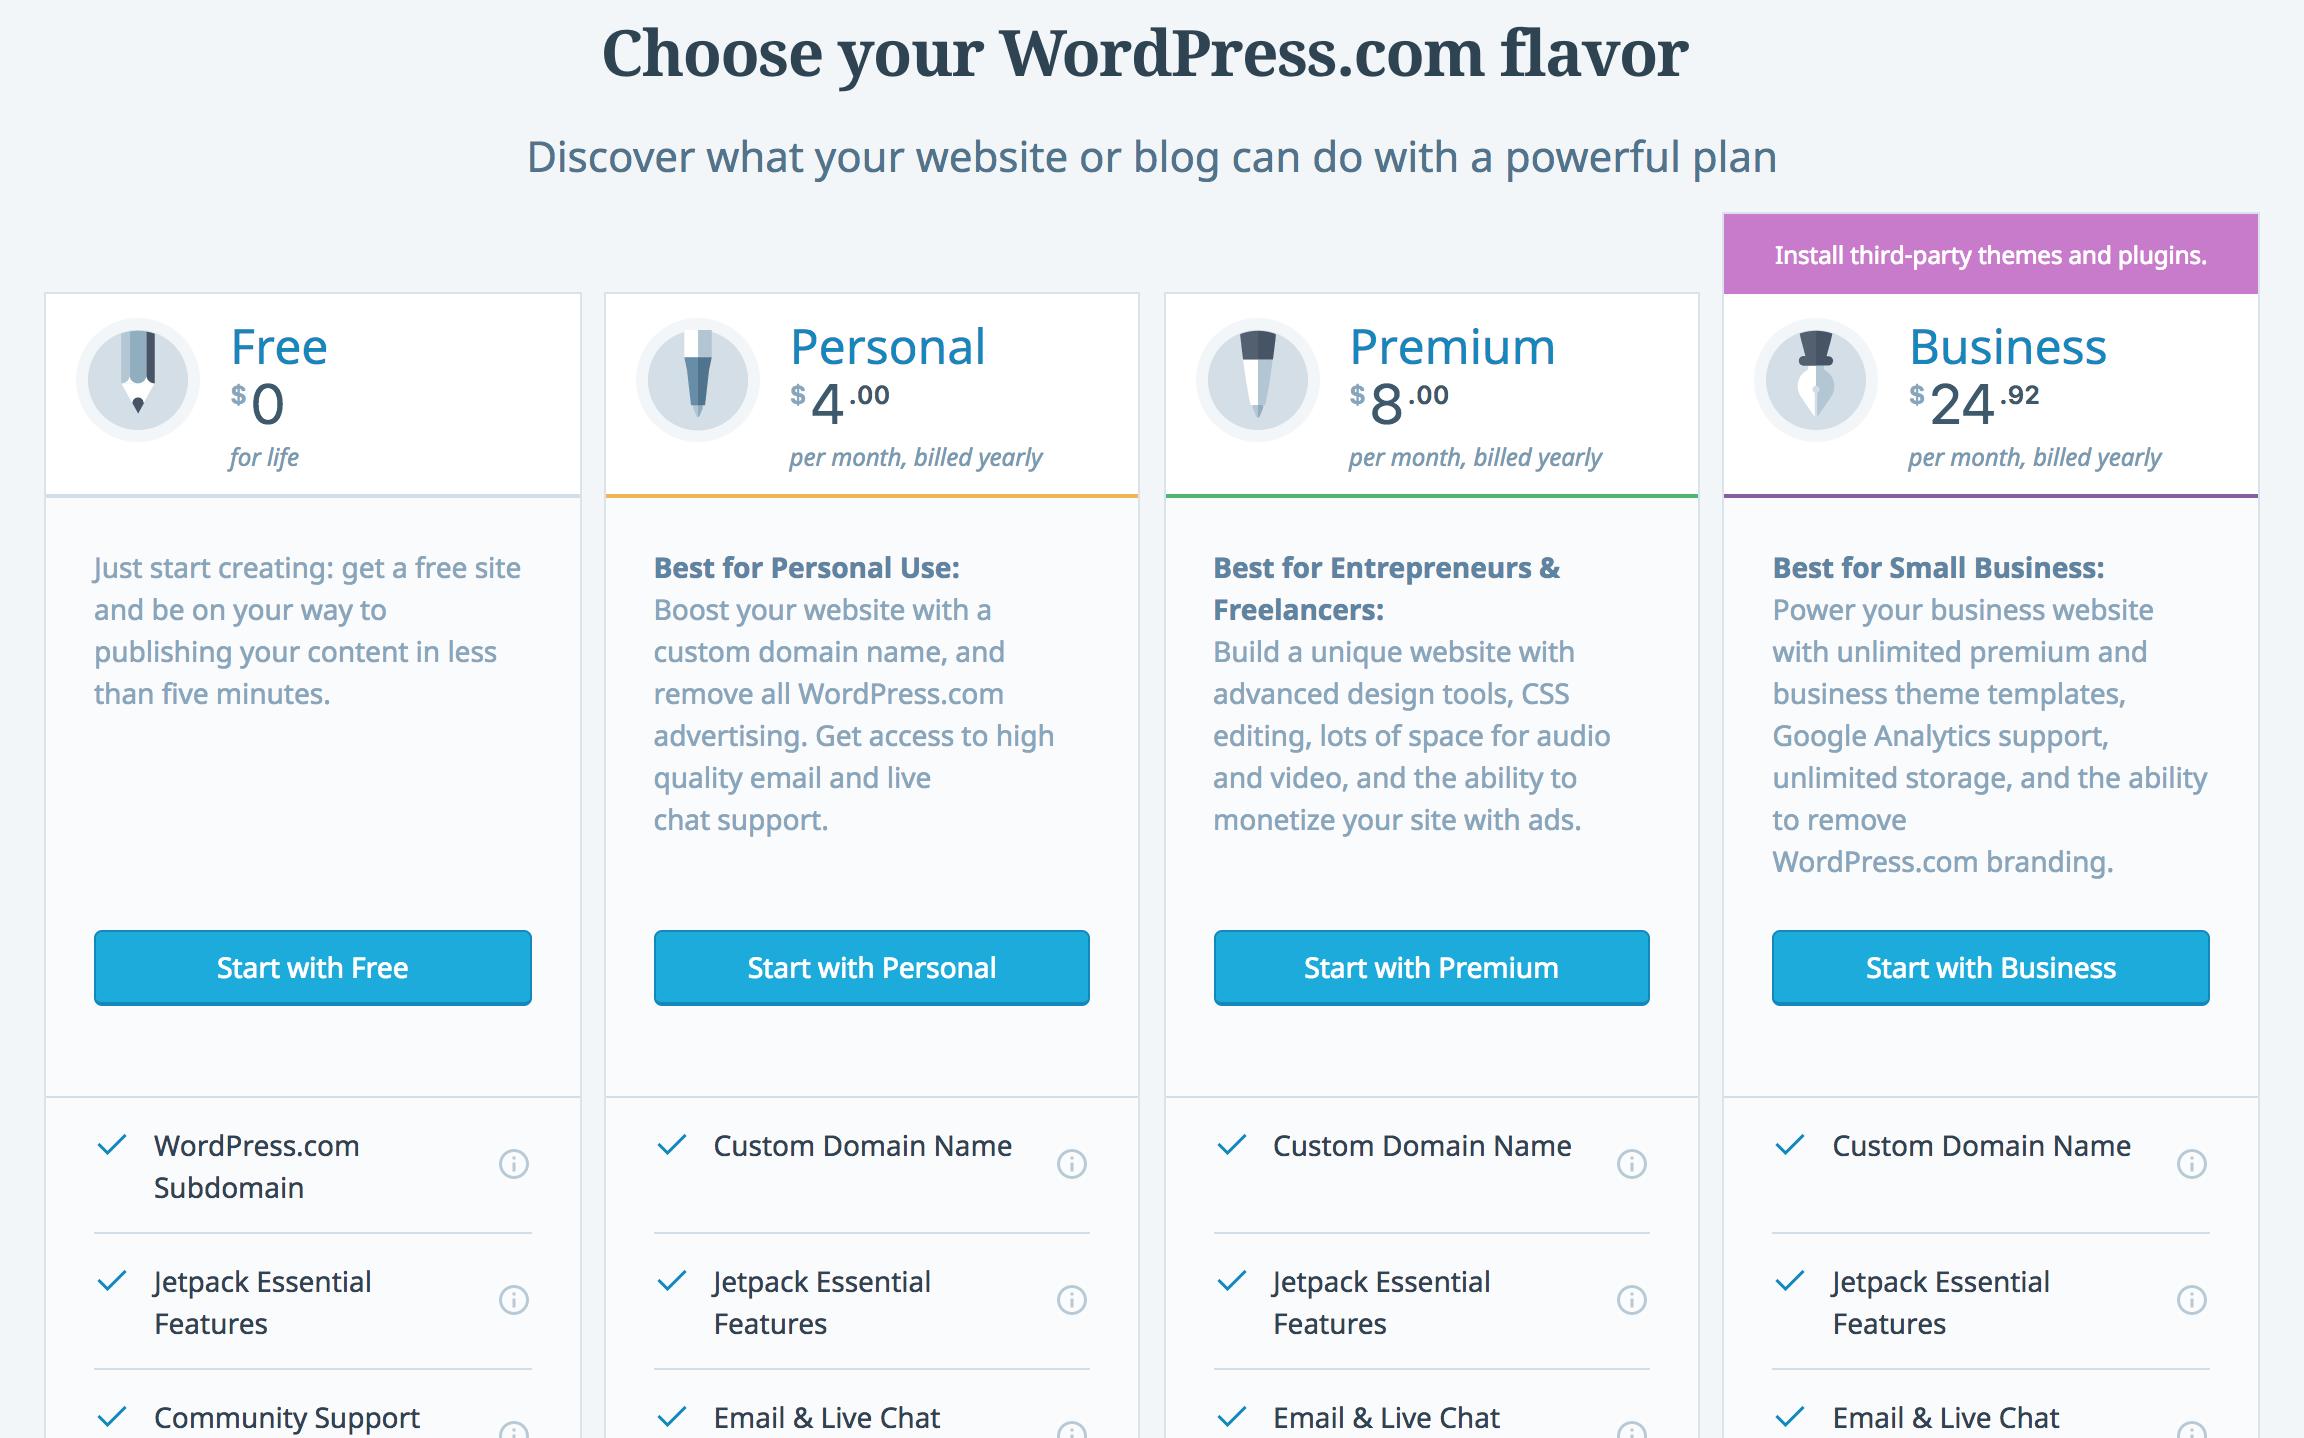 Alojamiento WordPress.com